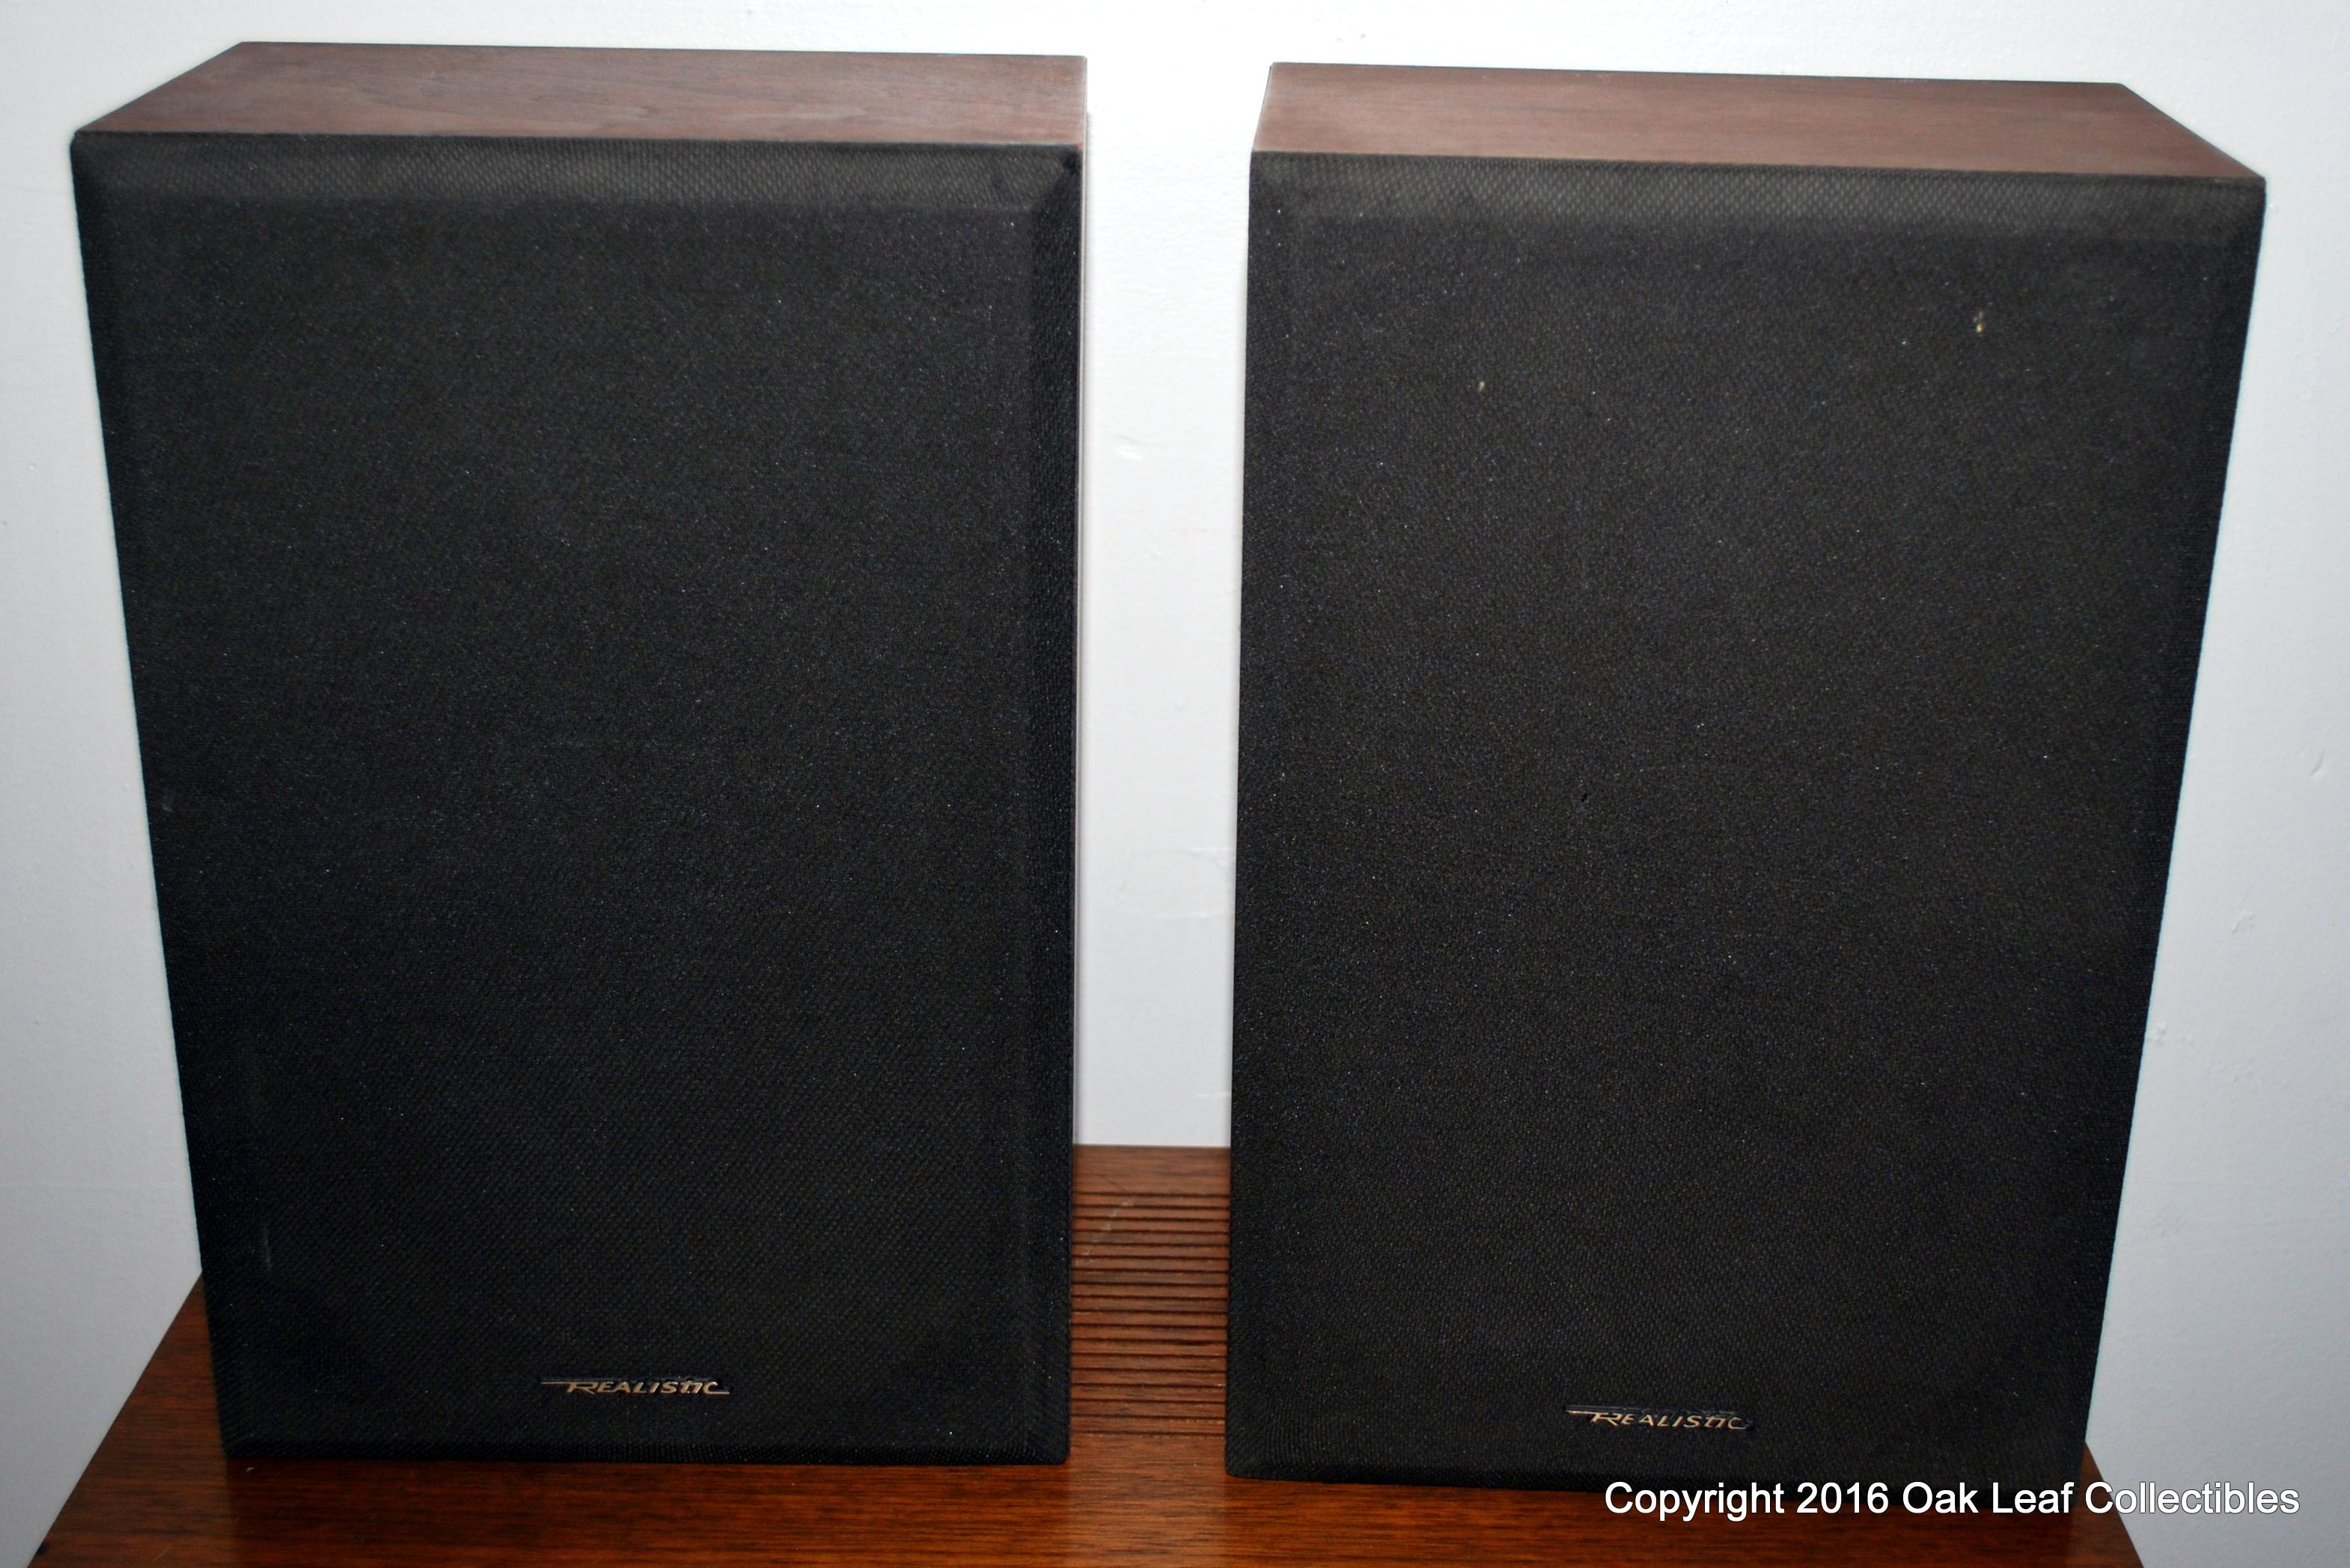 Realistic MC 800 Bookshelf Stereo Passive Audio Speakers